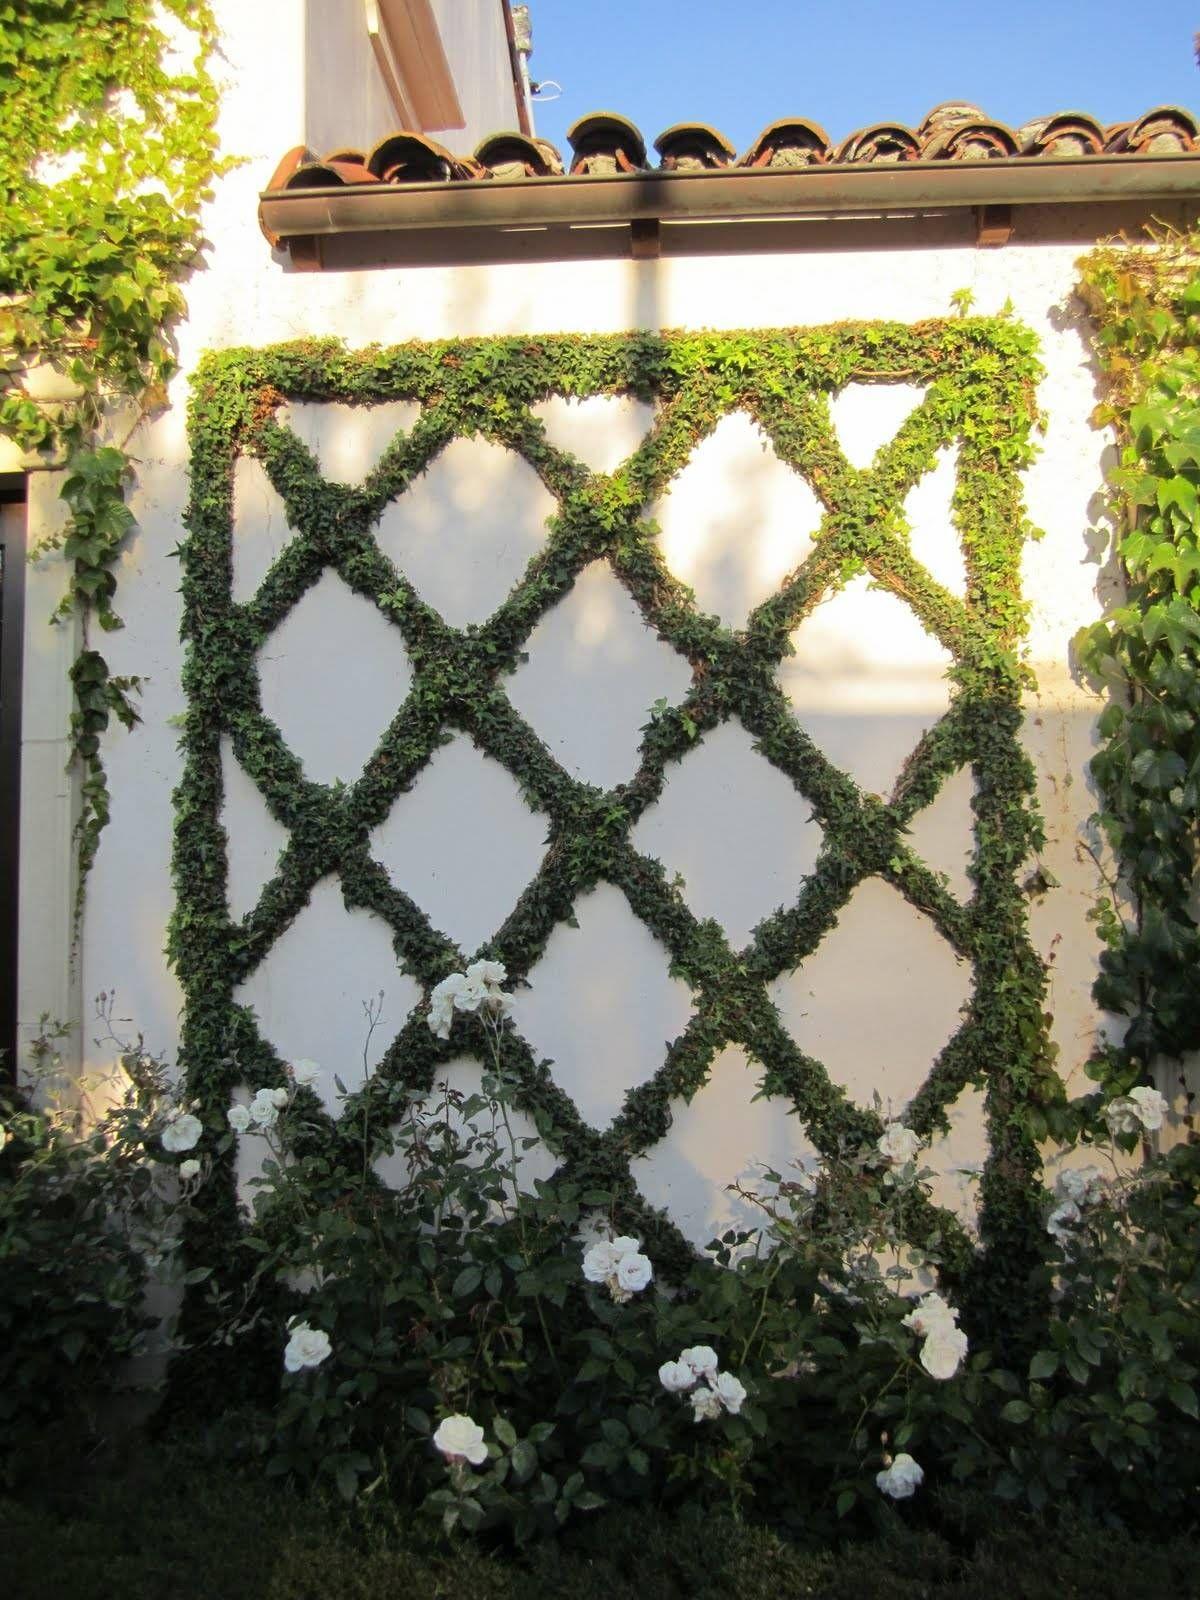 Diamond Wire Espalier Garden Lovescapes Diy Garden